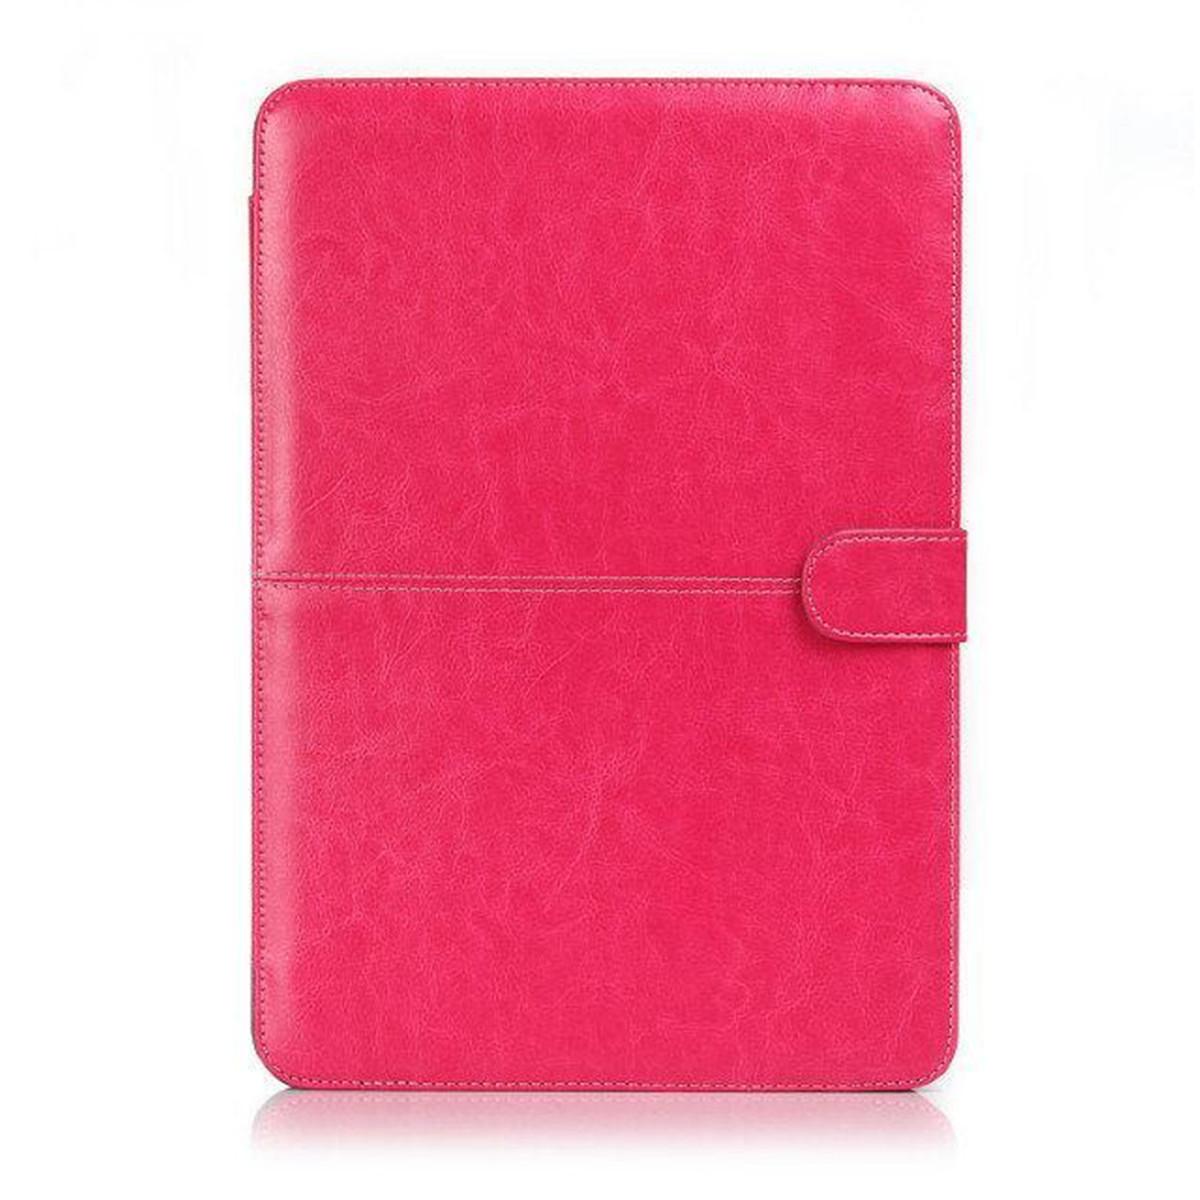 pu cuir laptop coque etui housse protecteur pr macbook air pro retina 11 13 15 ebay